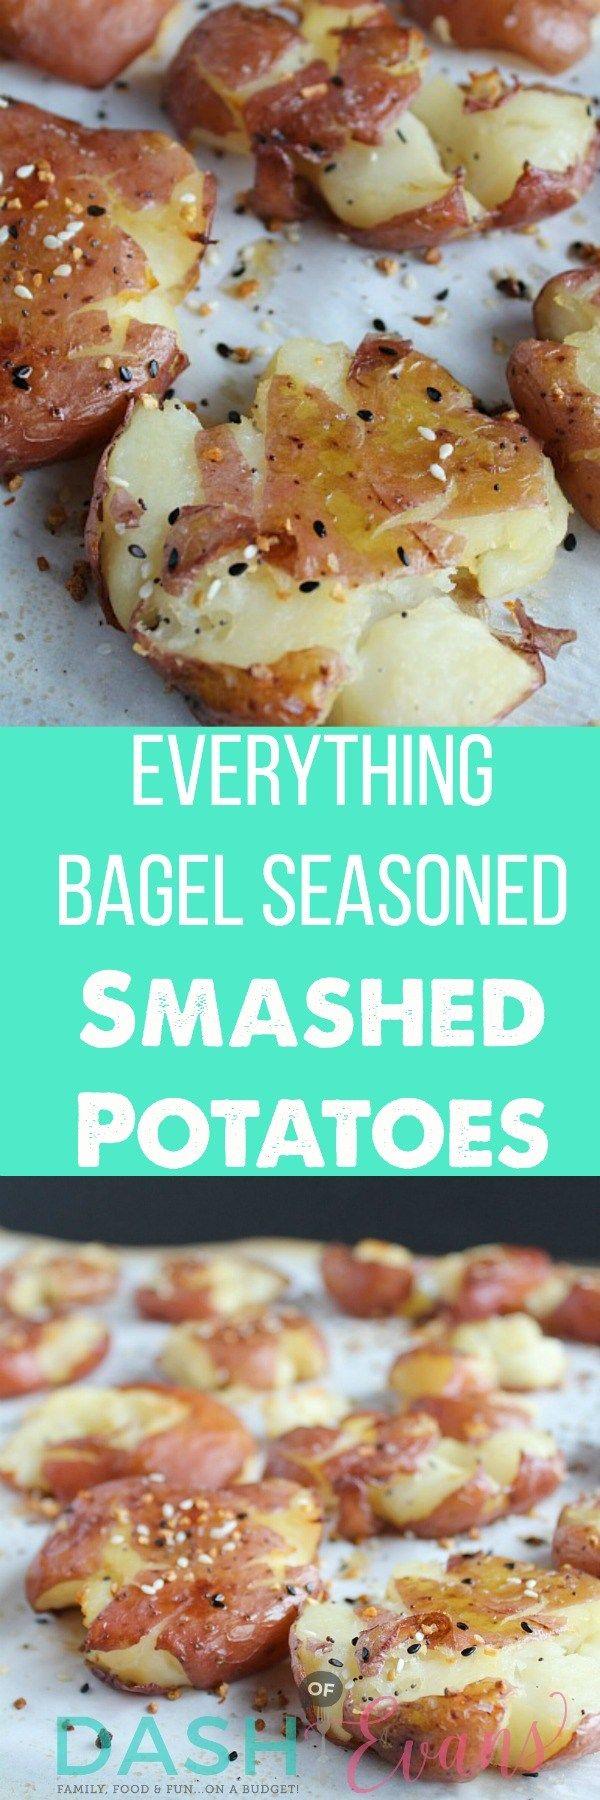 643 best happy belly images on Pinterest | Cooking food, Bon appetit ...